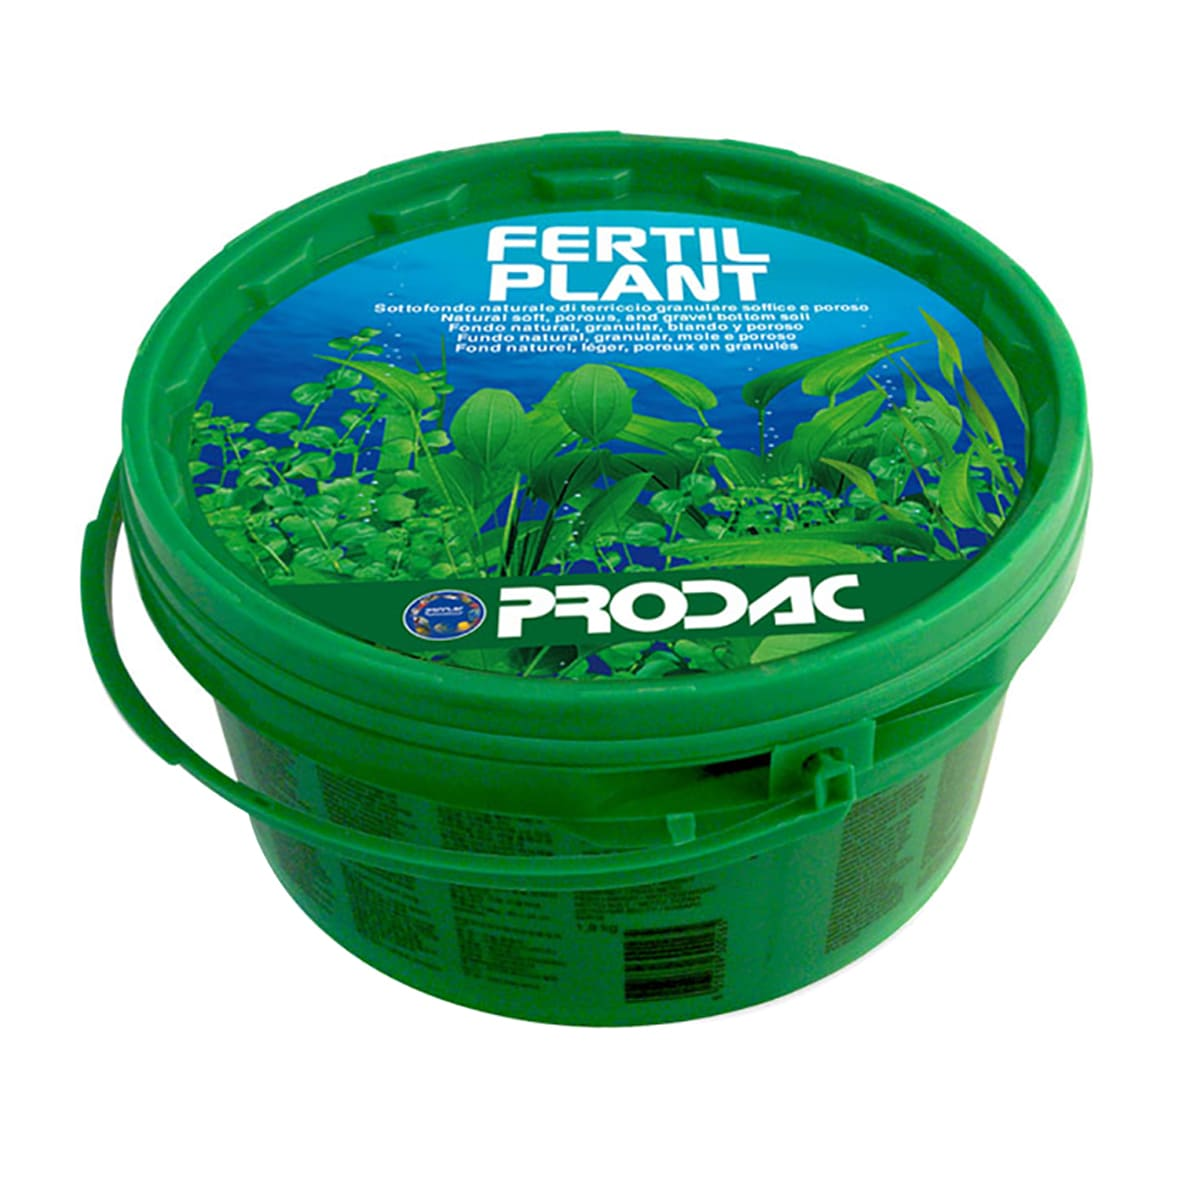 Substrato Prodac Fertil Plant 1,8kg 2,4l Aquario Plantado